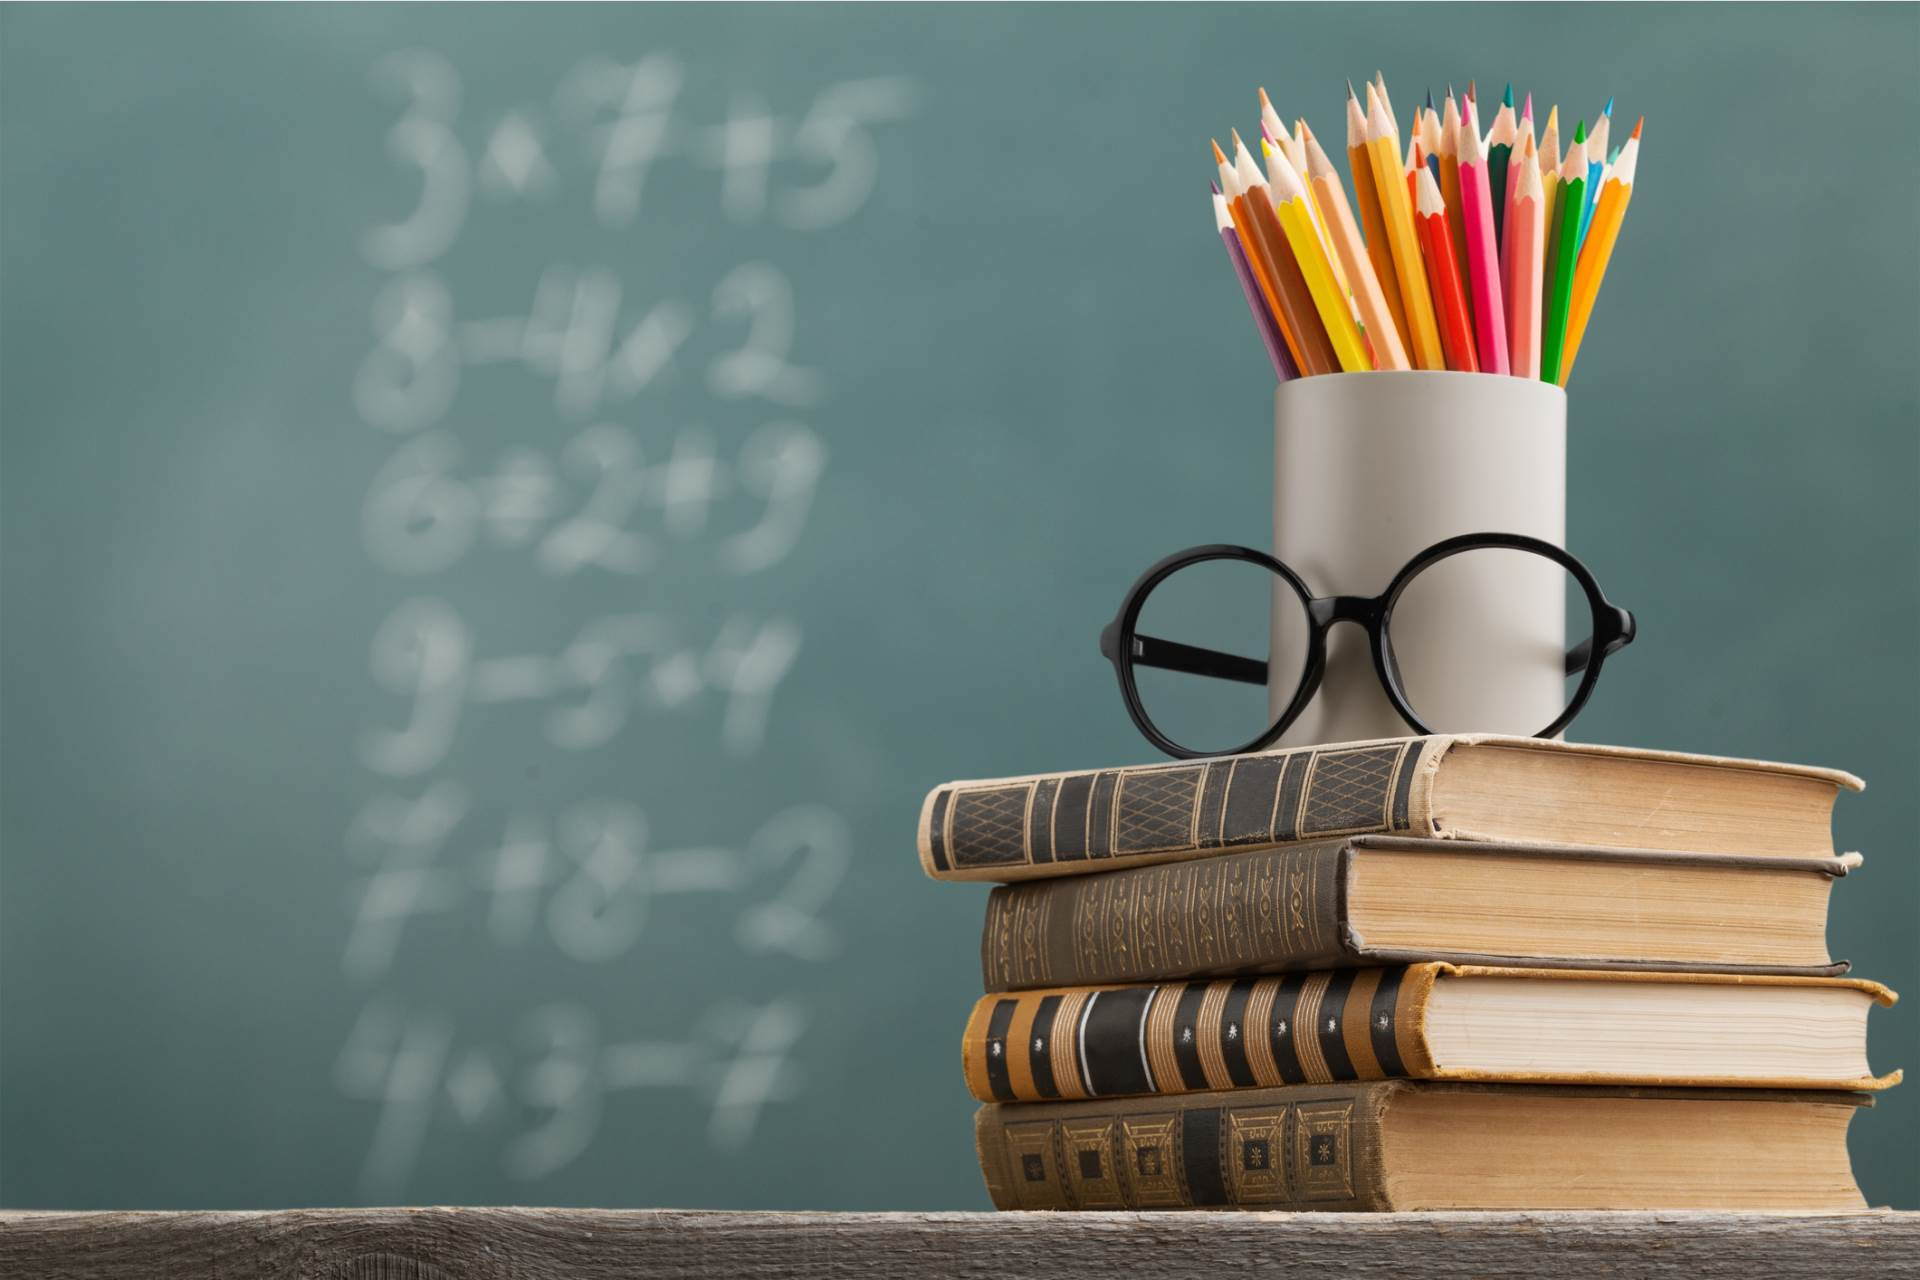 high,celebrate,concept,school,conceptual,books,pencils,internati